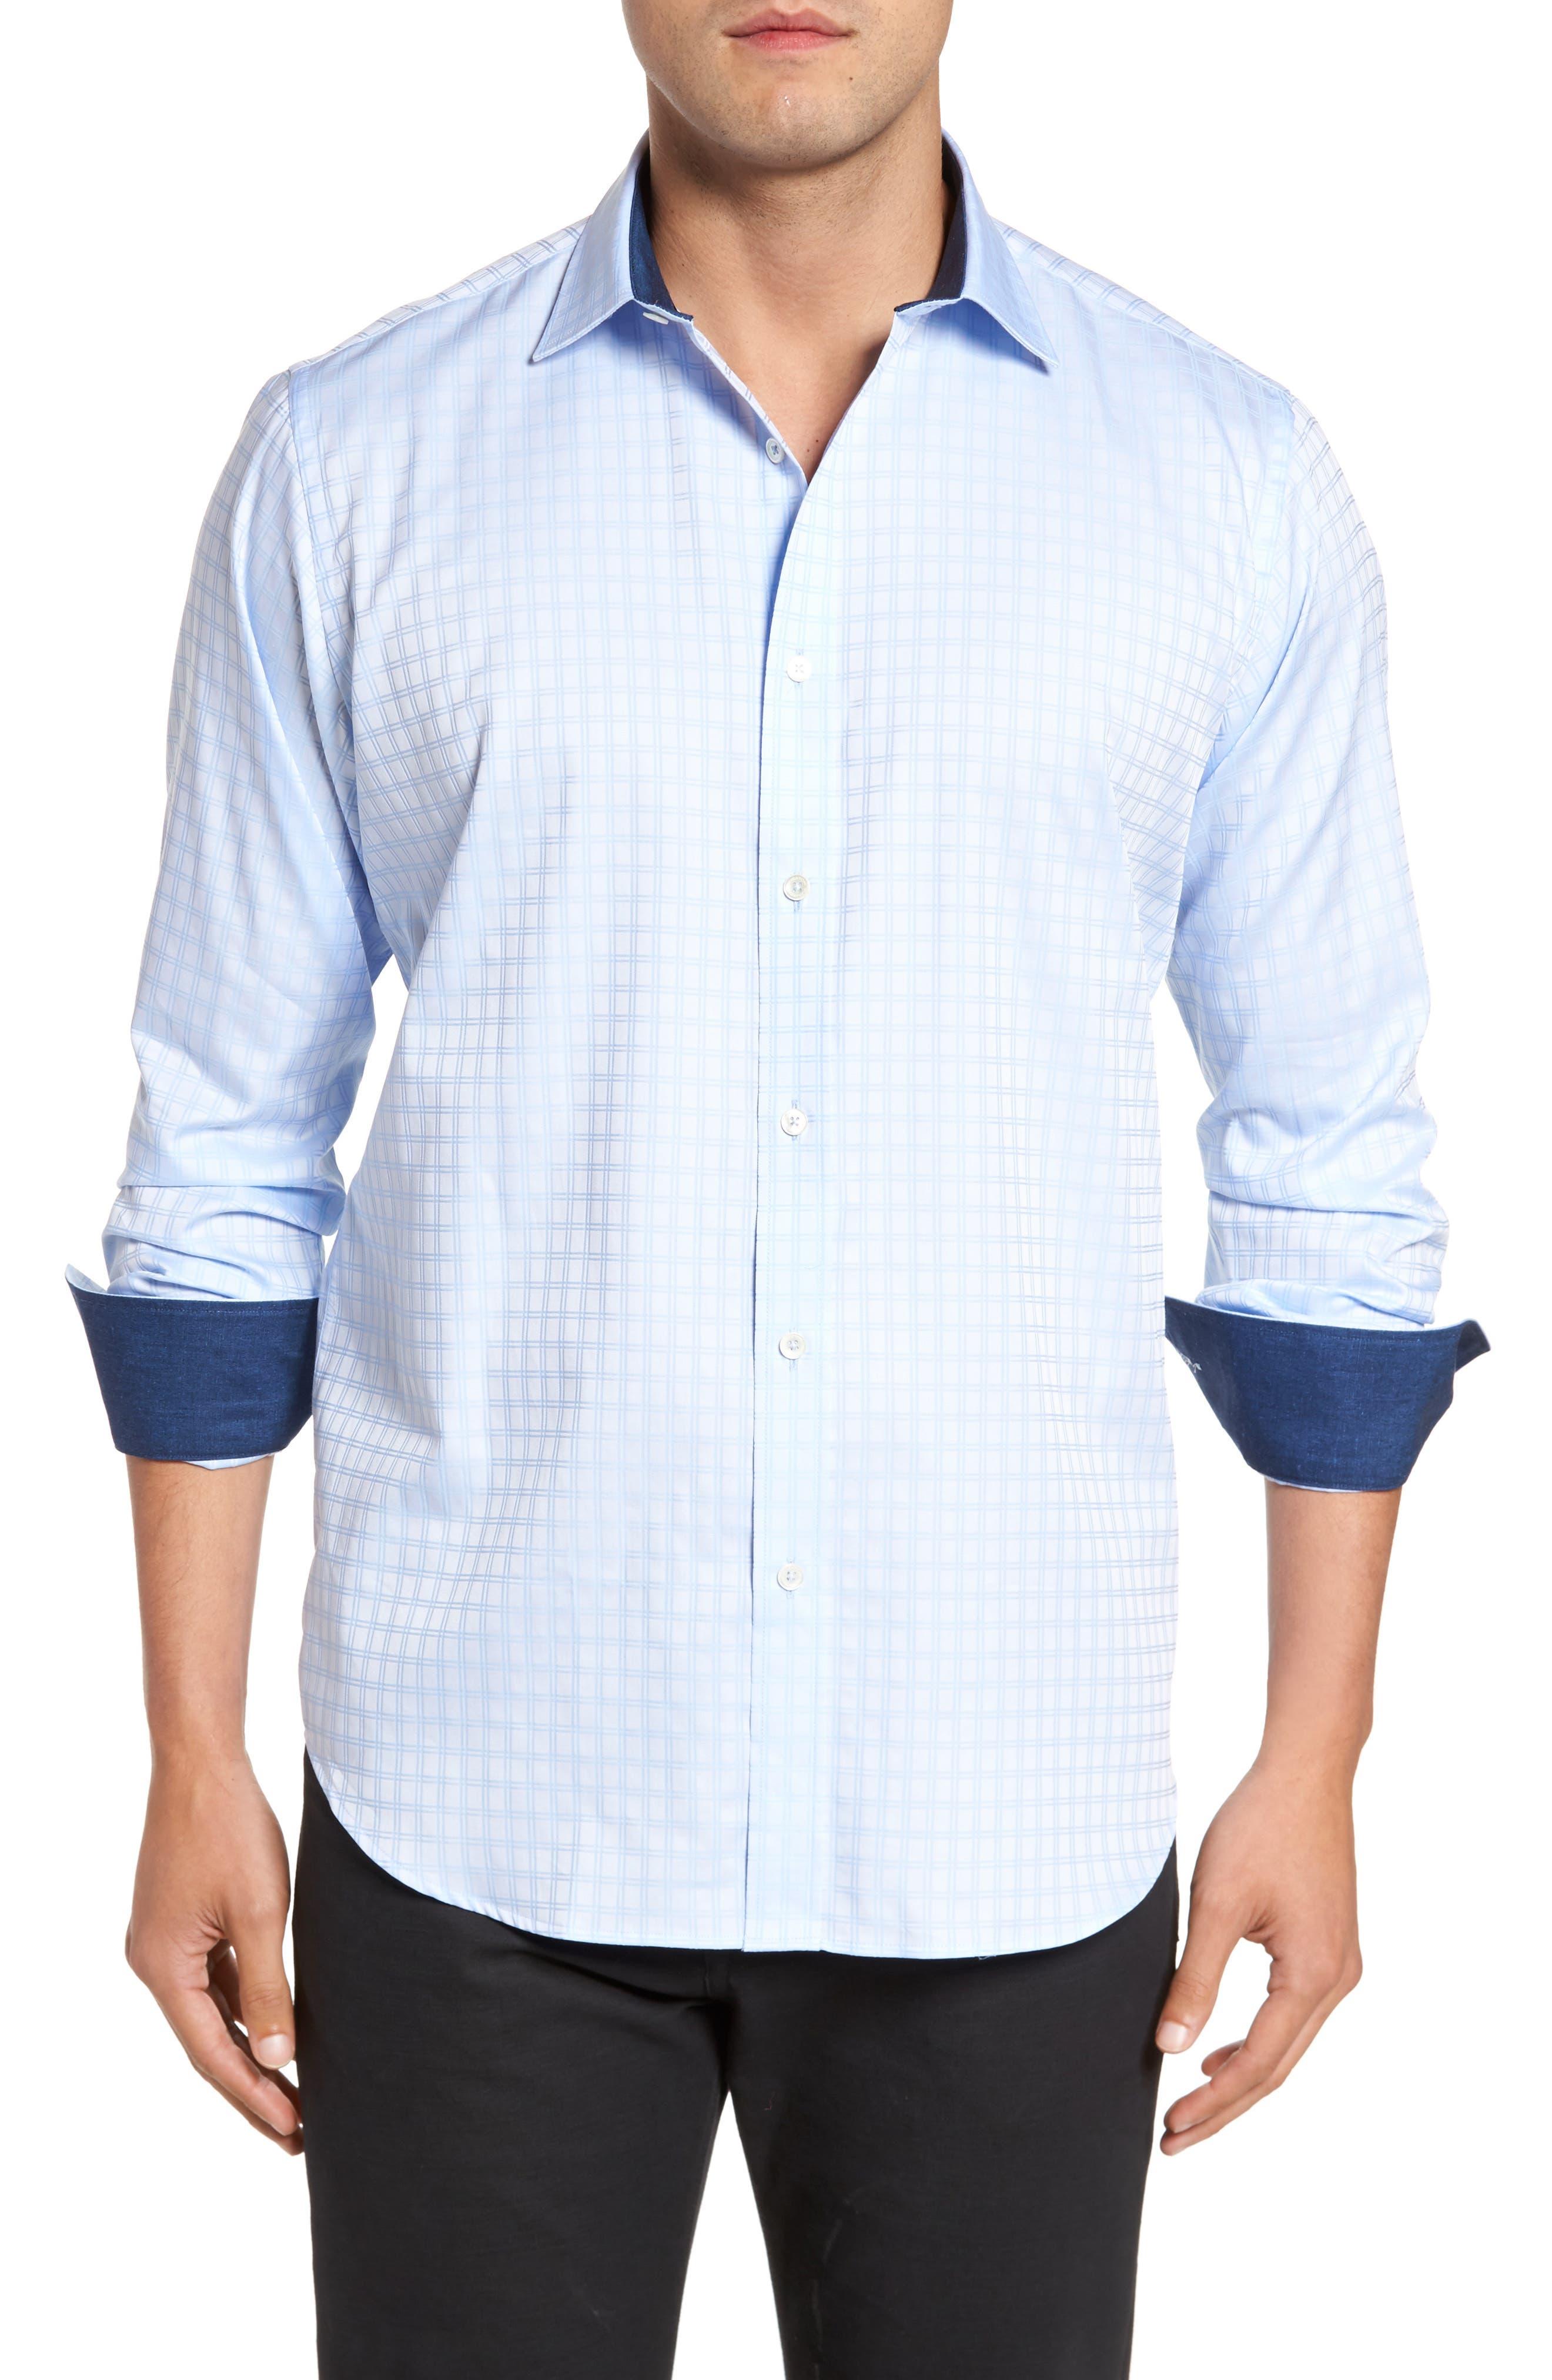 Main Image - Bugatchi Classic Fit Check Jacquard Sport Shirt